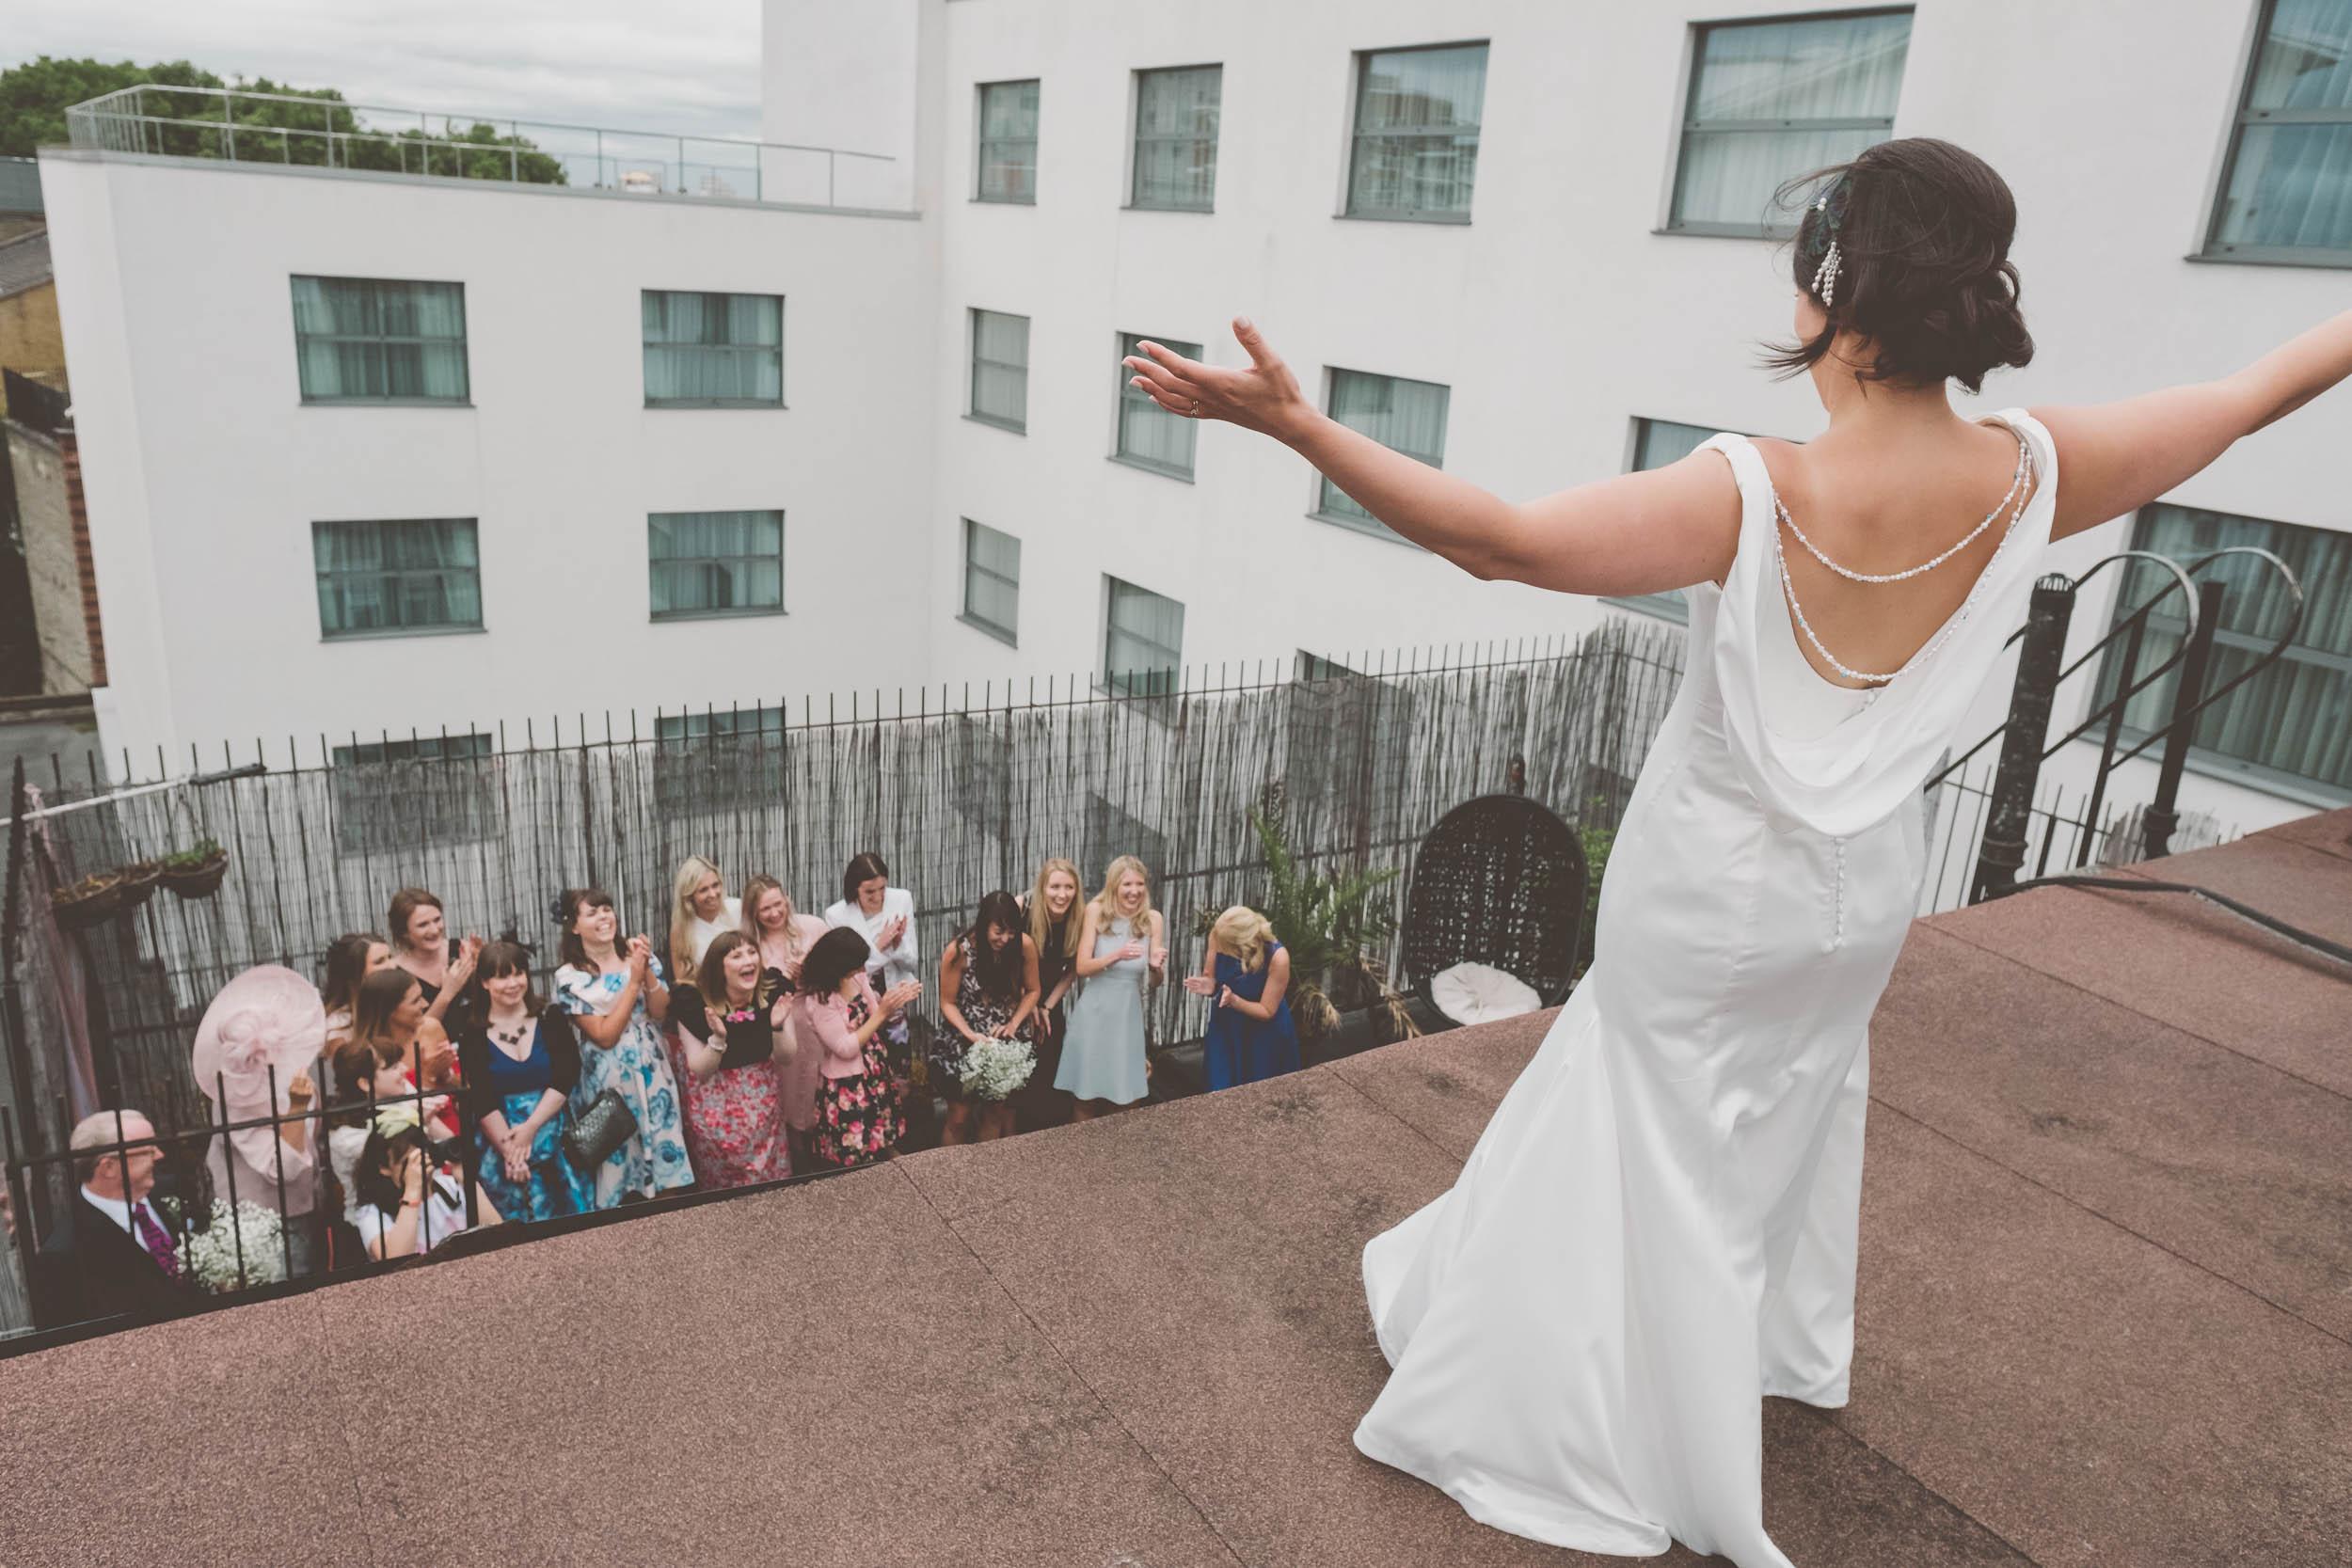 islington-town-hall-4th-floor-studios-wedding273.jpg